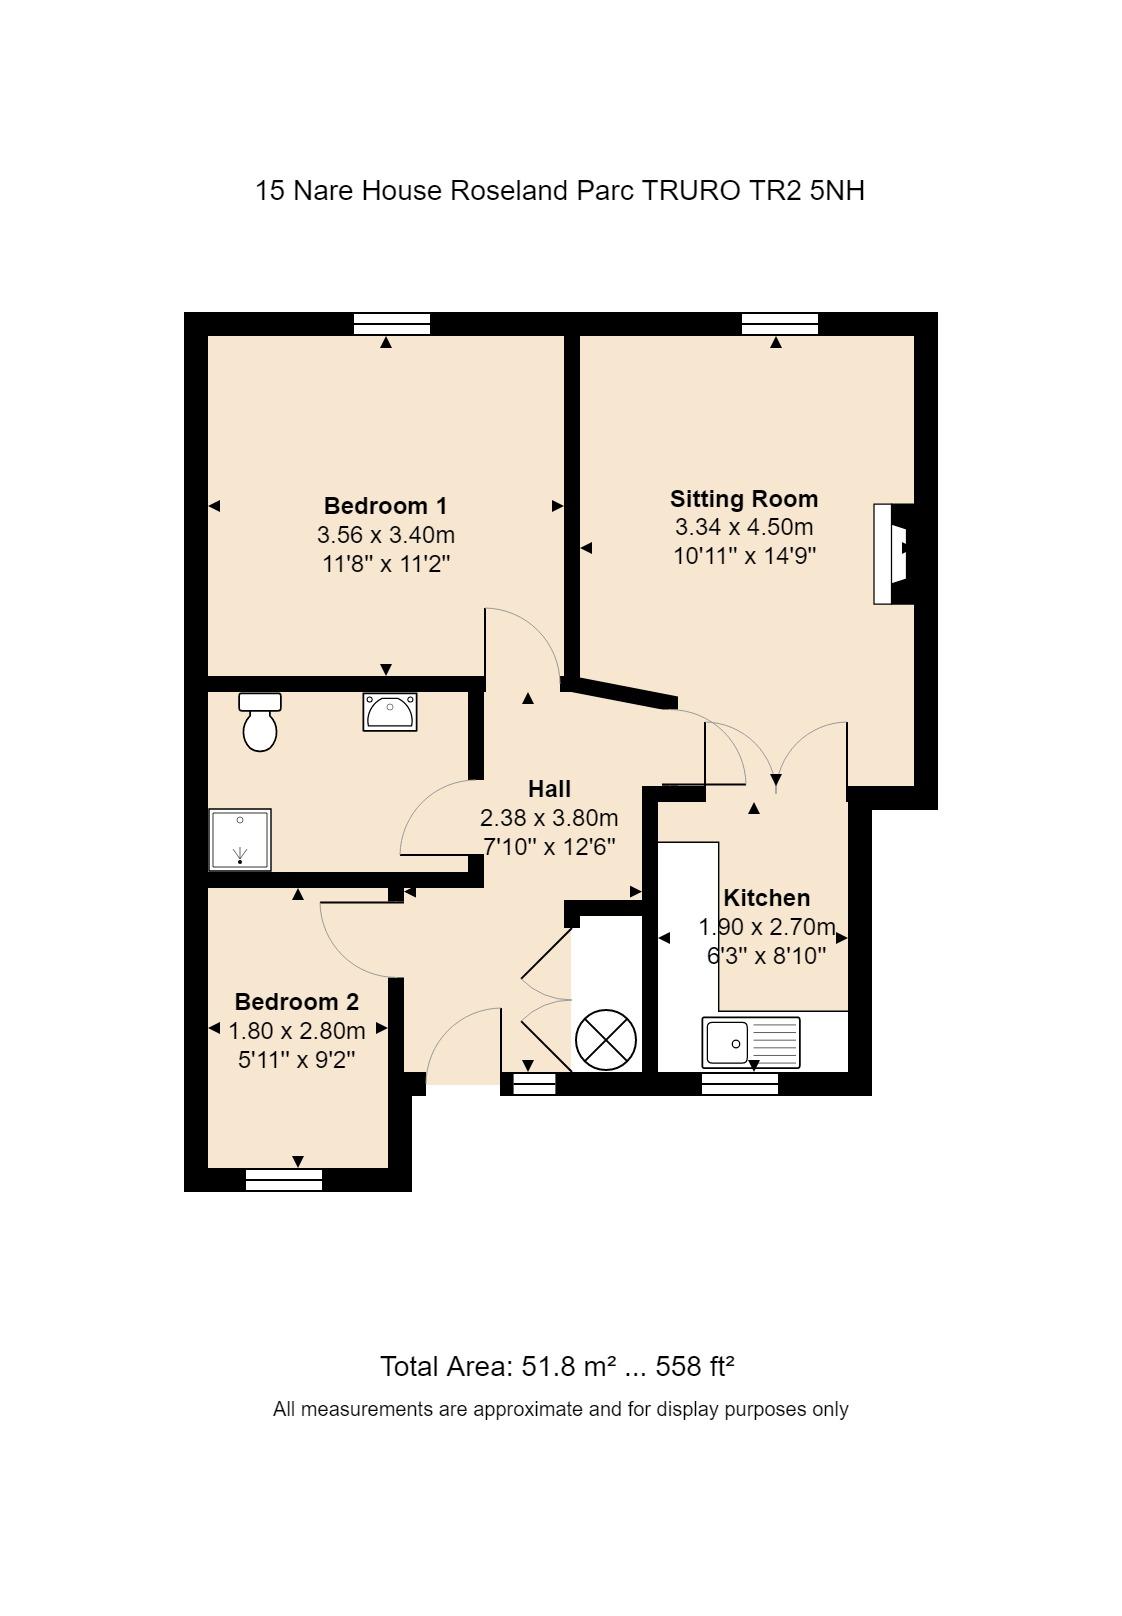 15 Nare House Floorplan